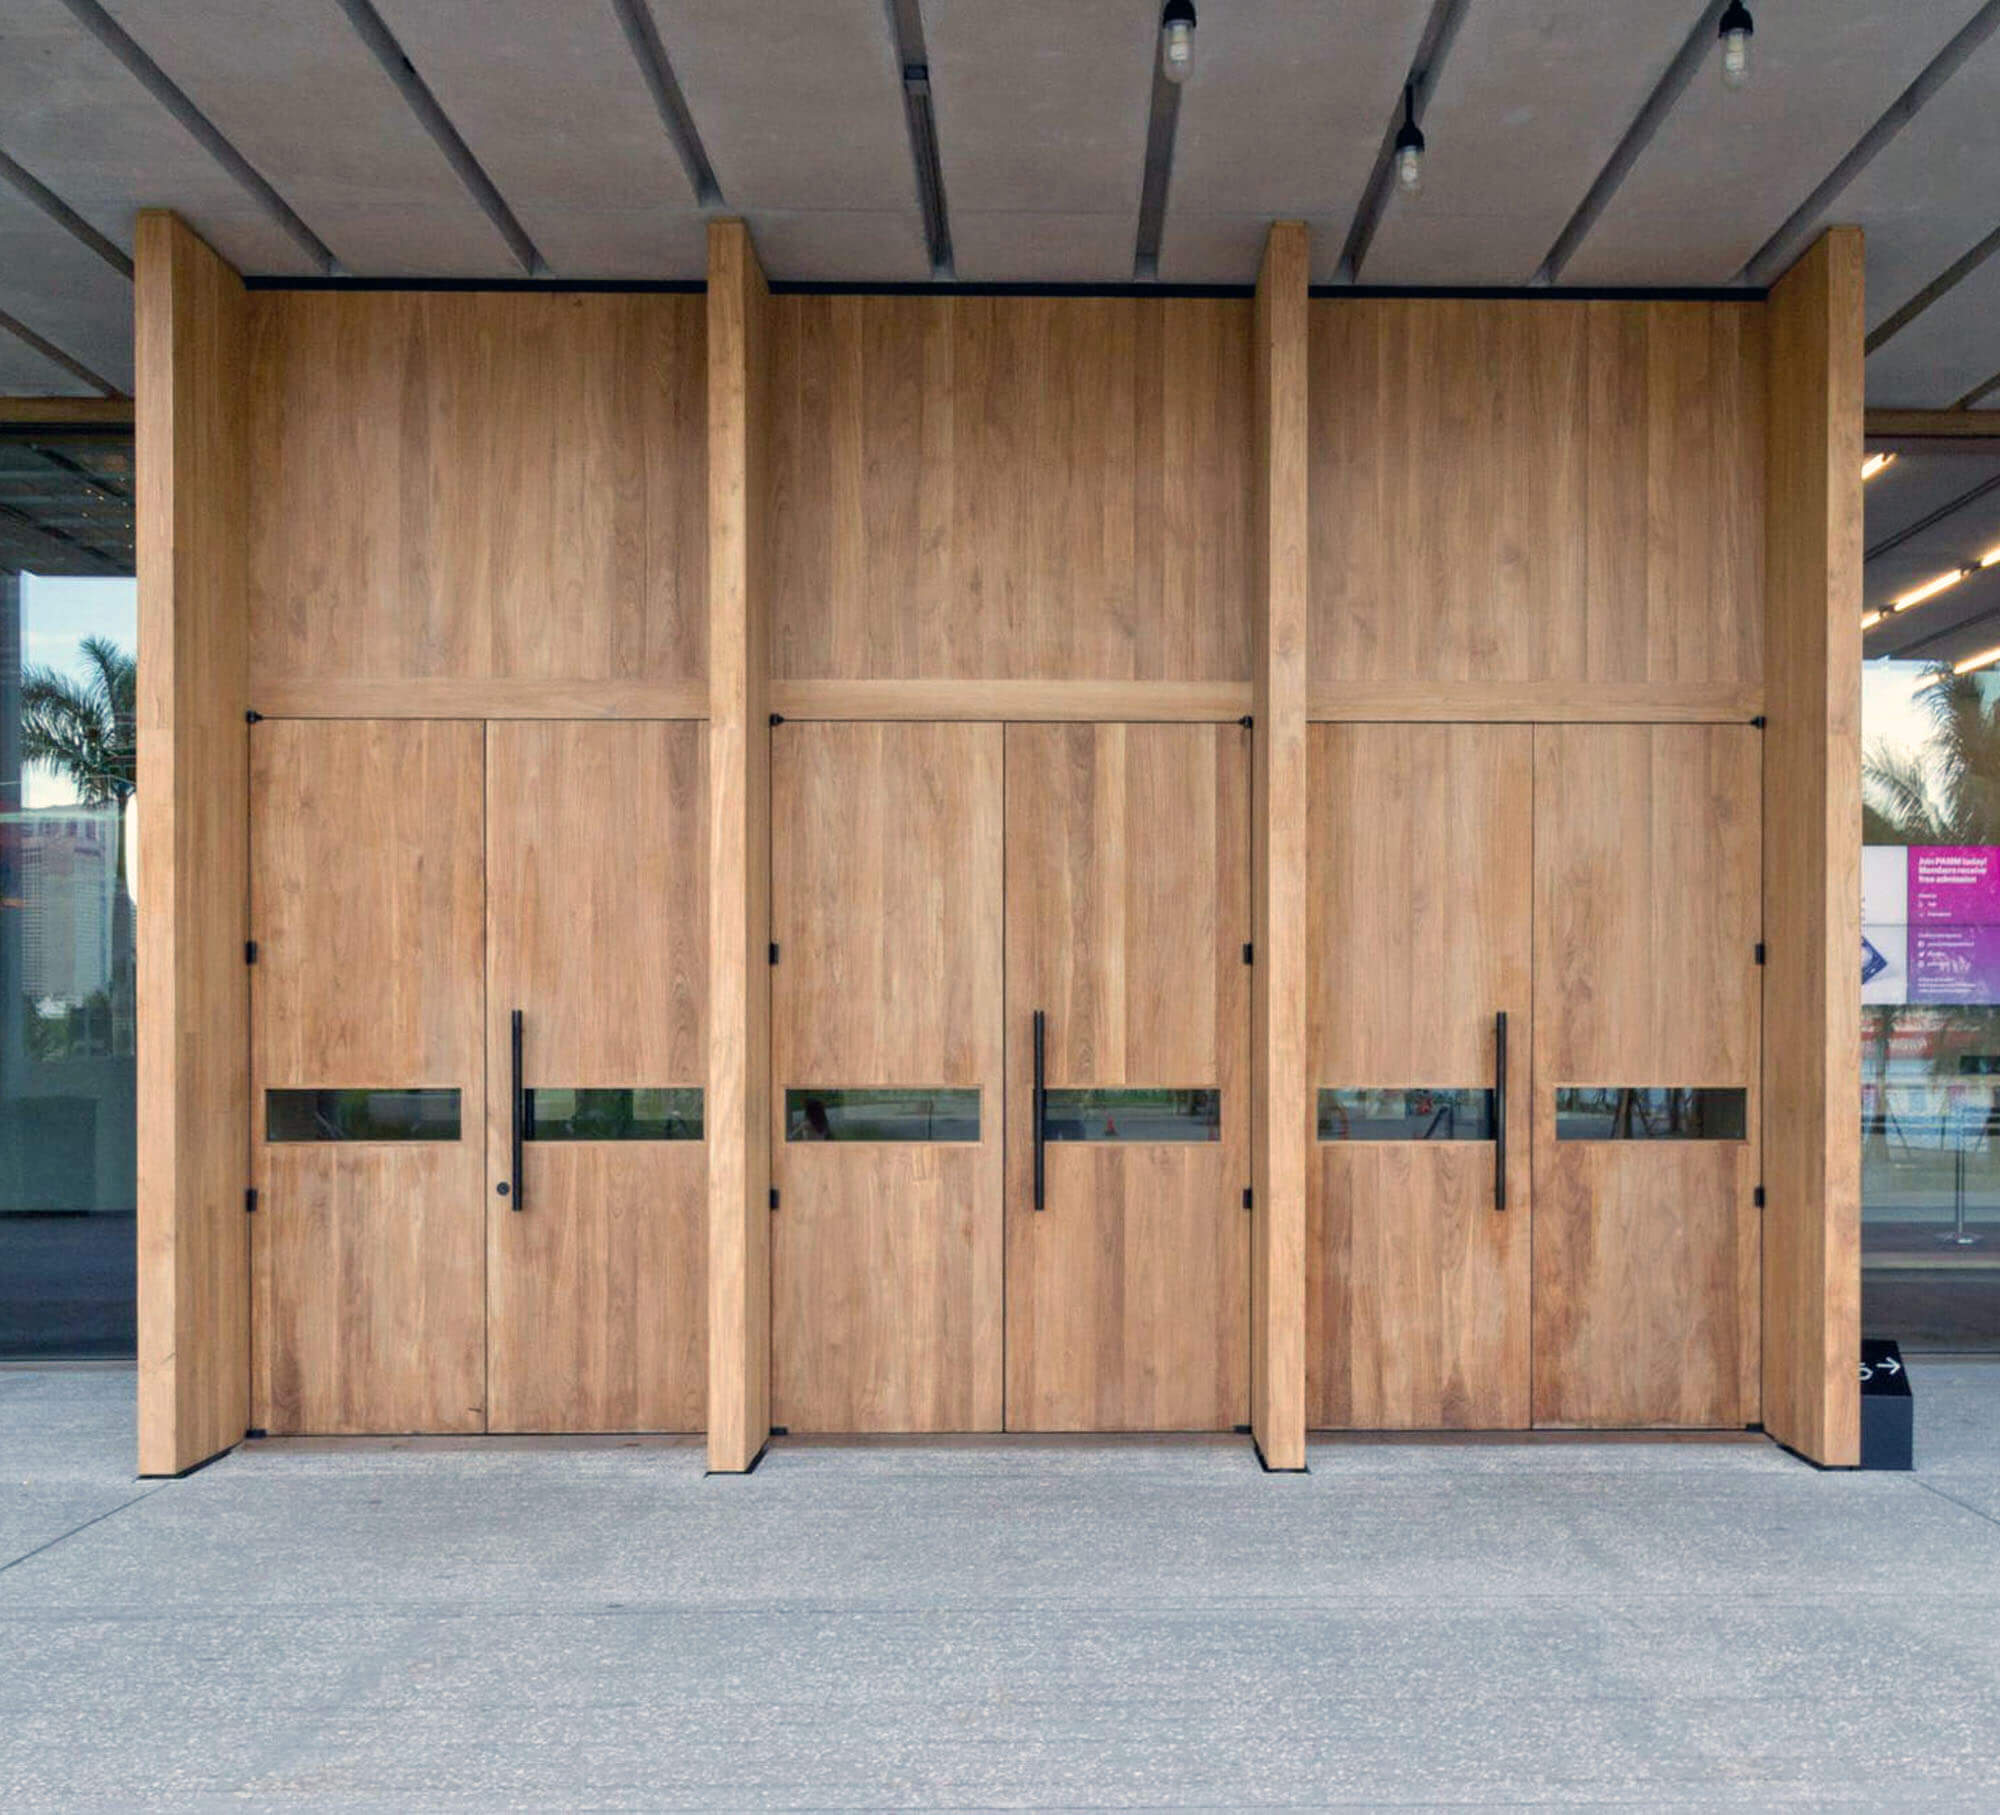 TEAK ENTRY DOORS. MIAMI PEREZ ART MUSEUM